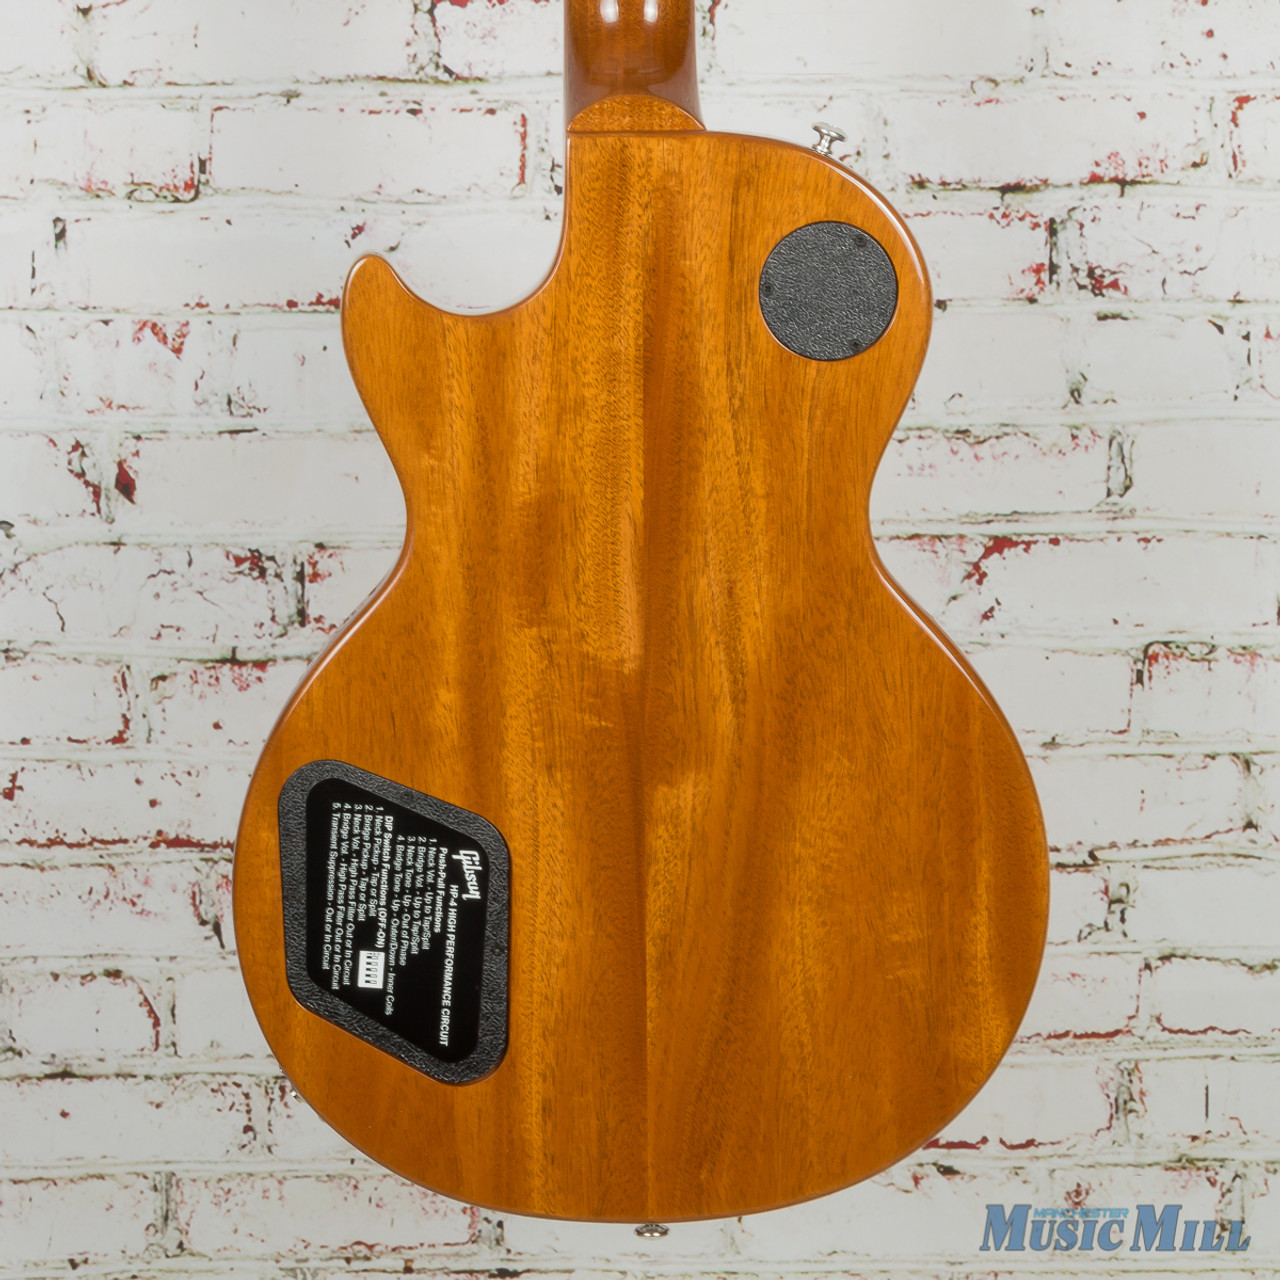 2018 Gibson Les Paul Standard Mojave Burst w/OHSC MINT 1644 (USED)